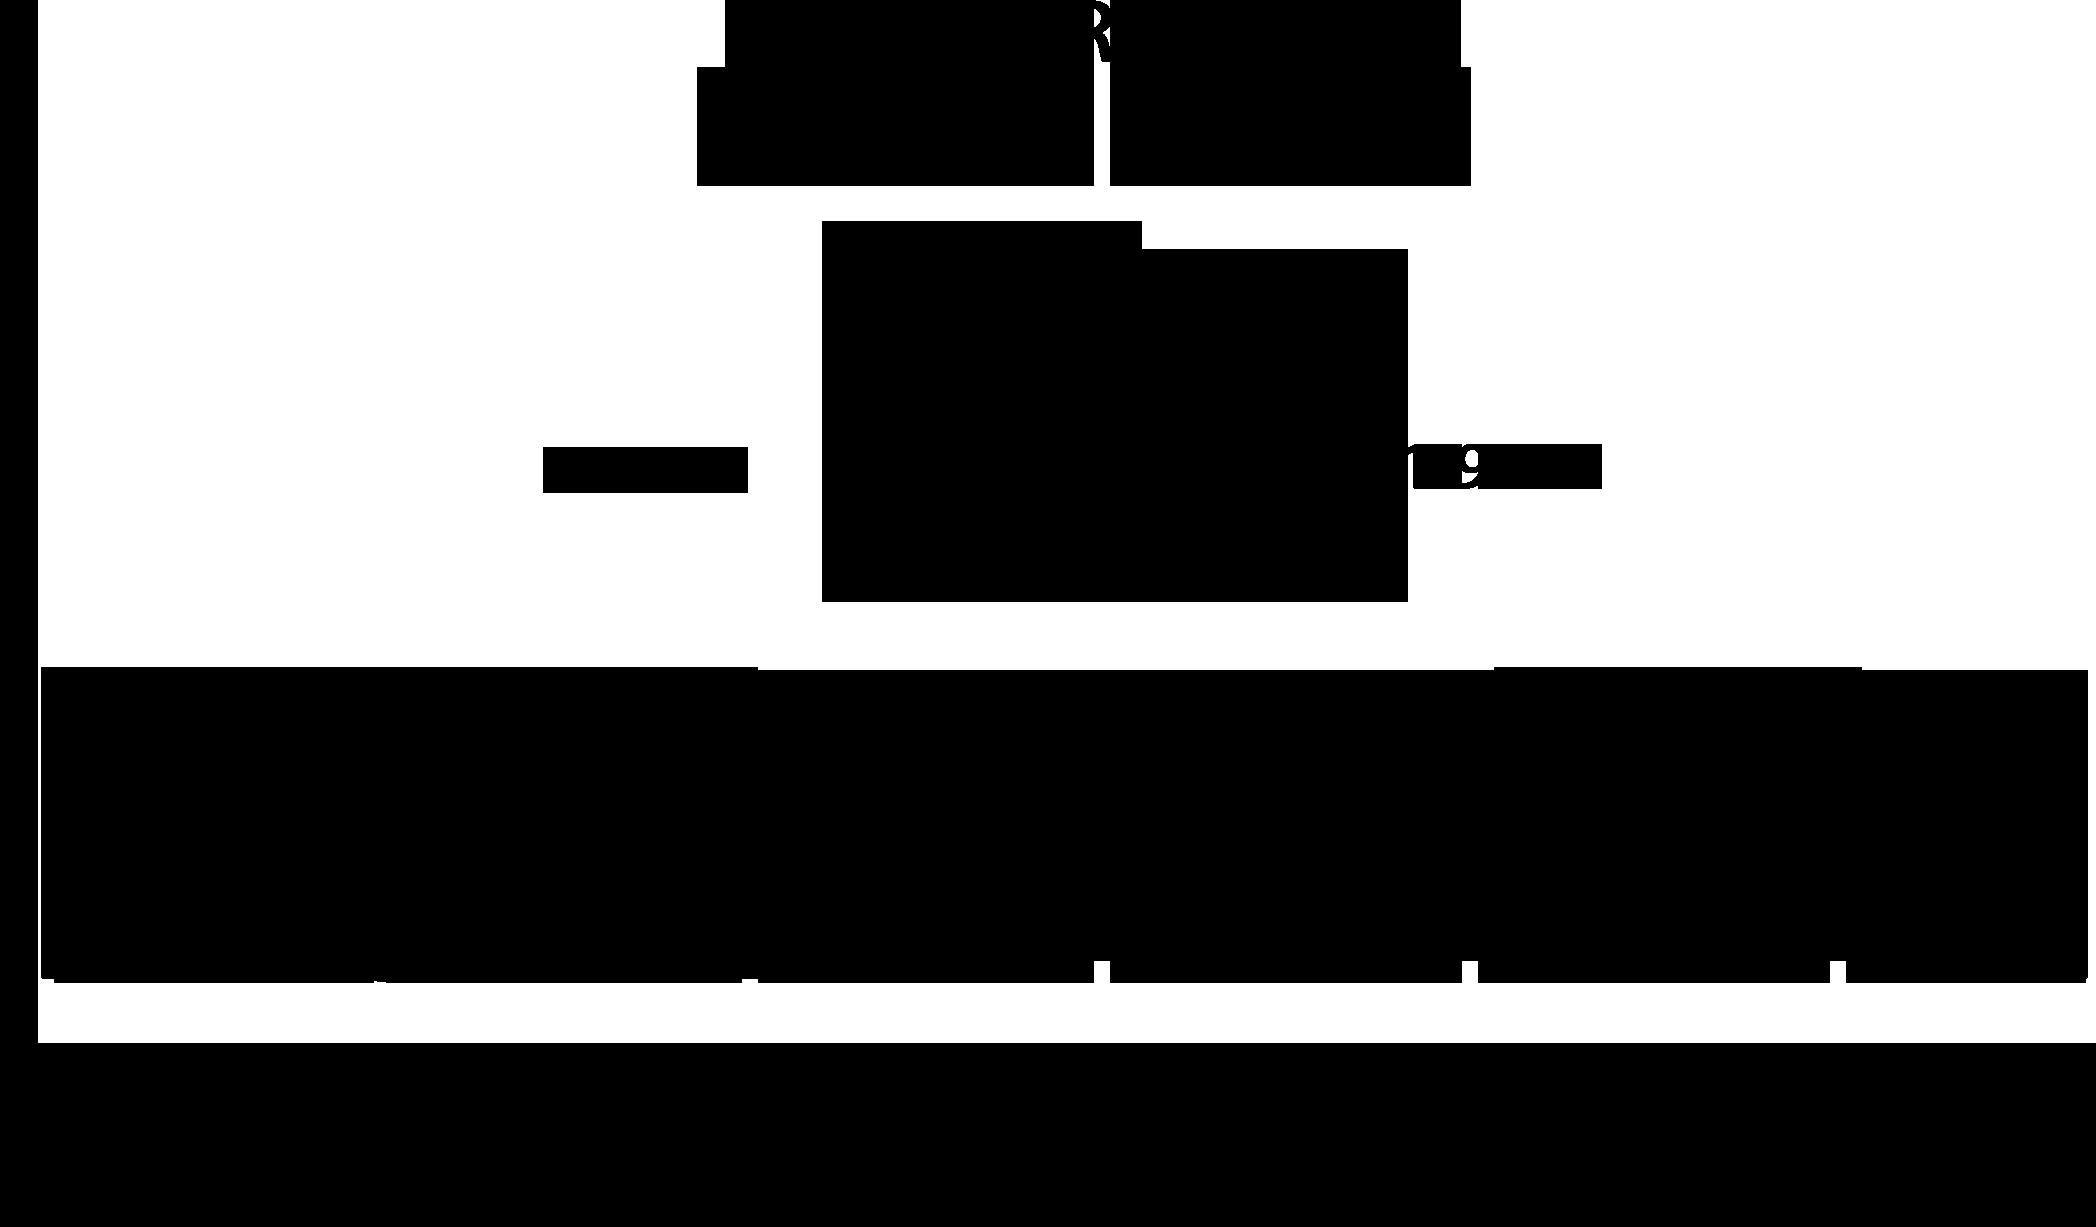 Cachorros Kowalski